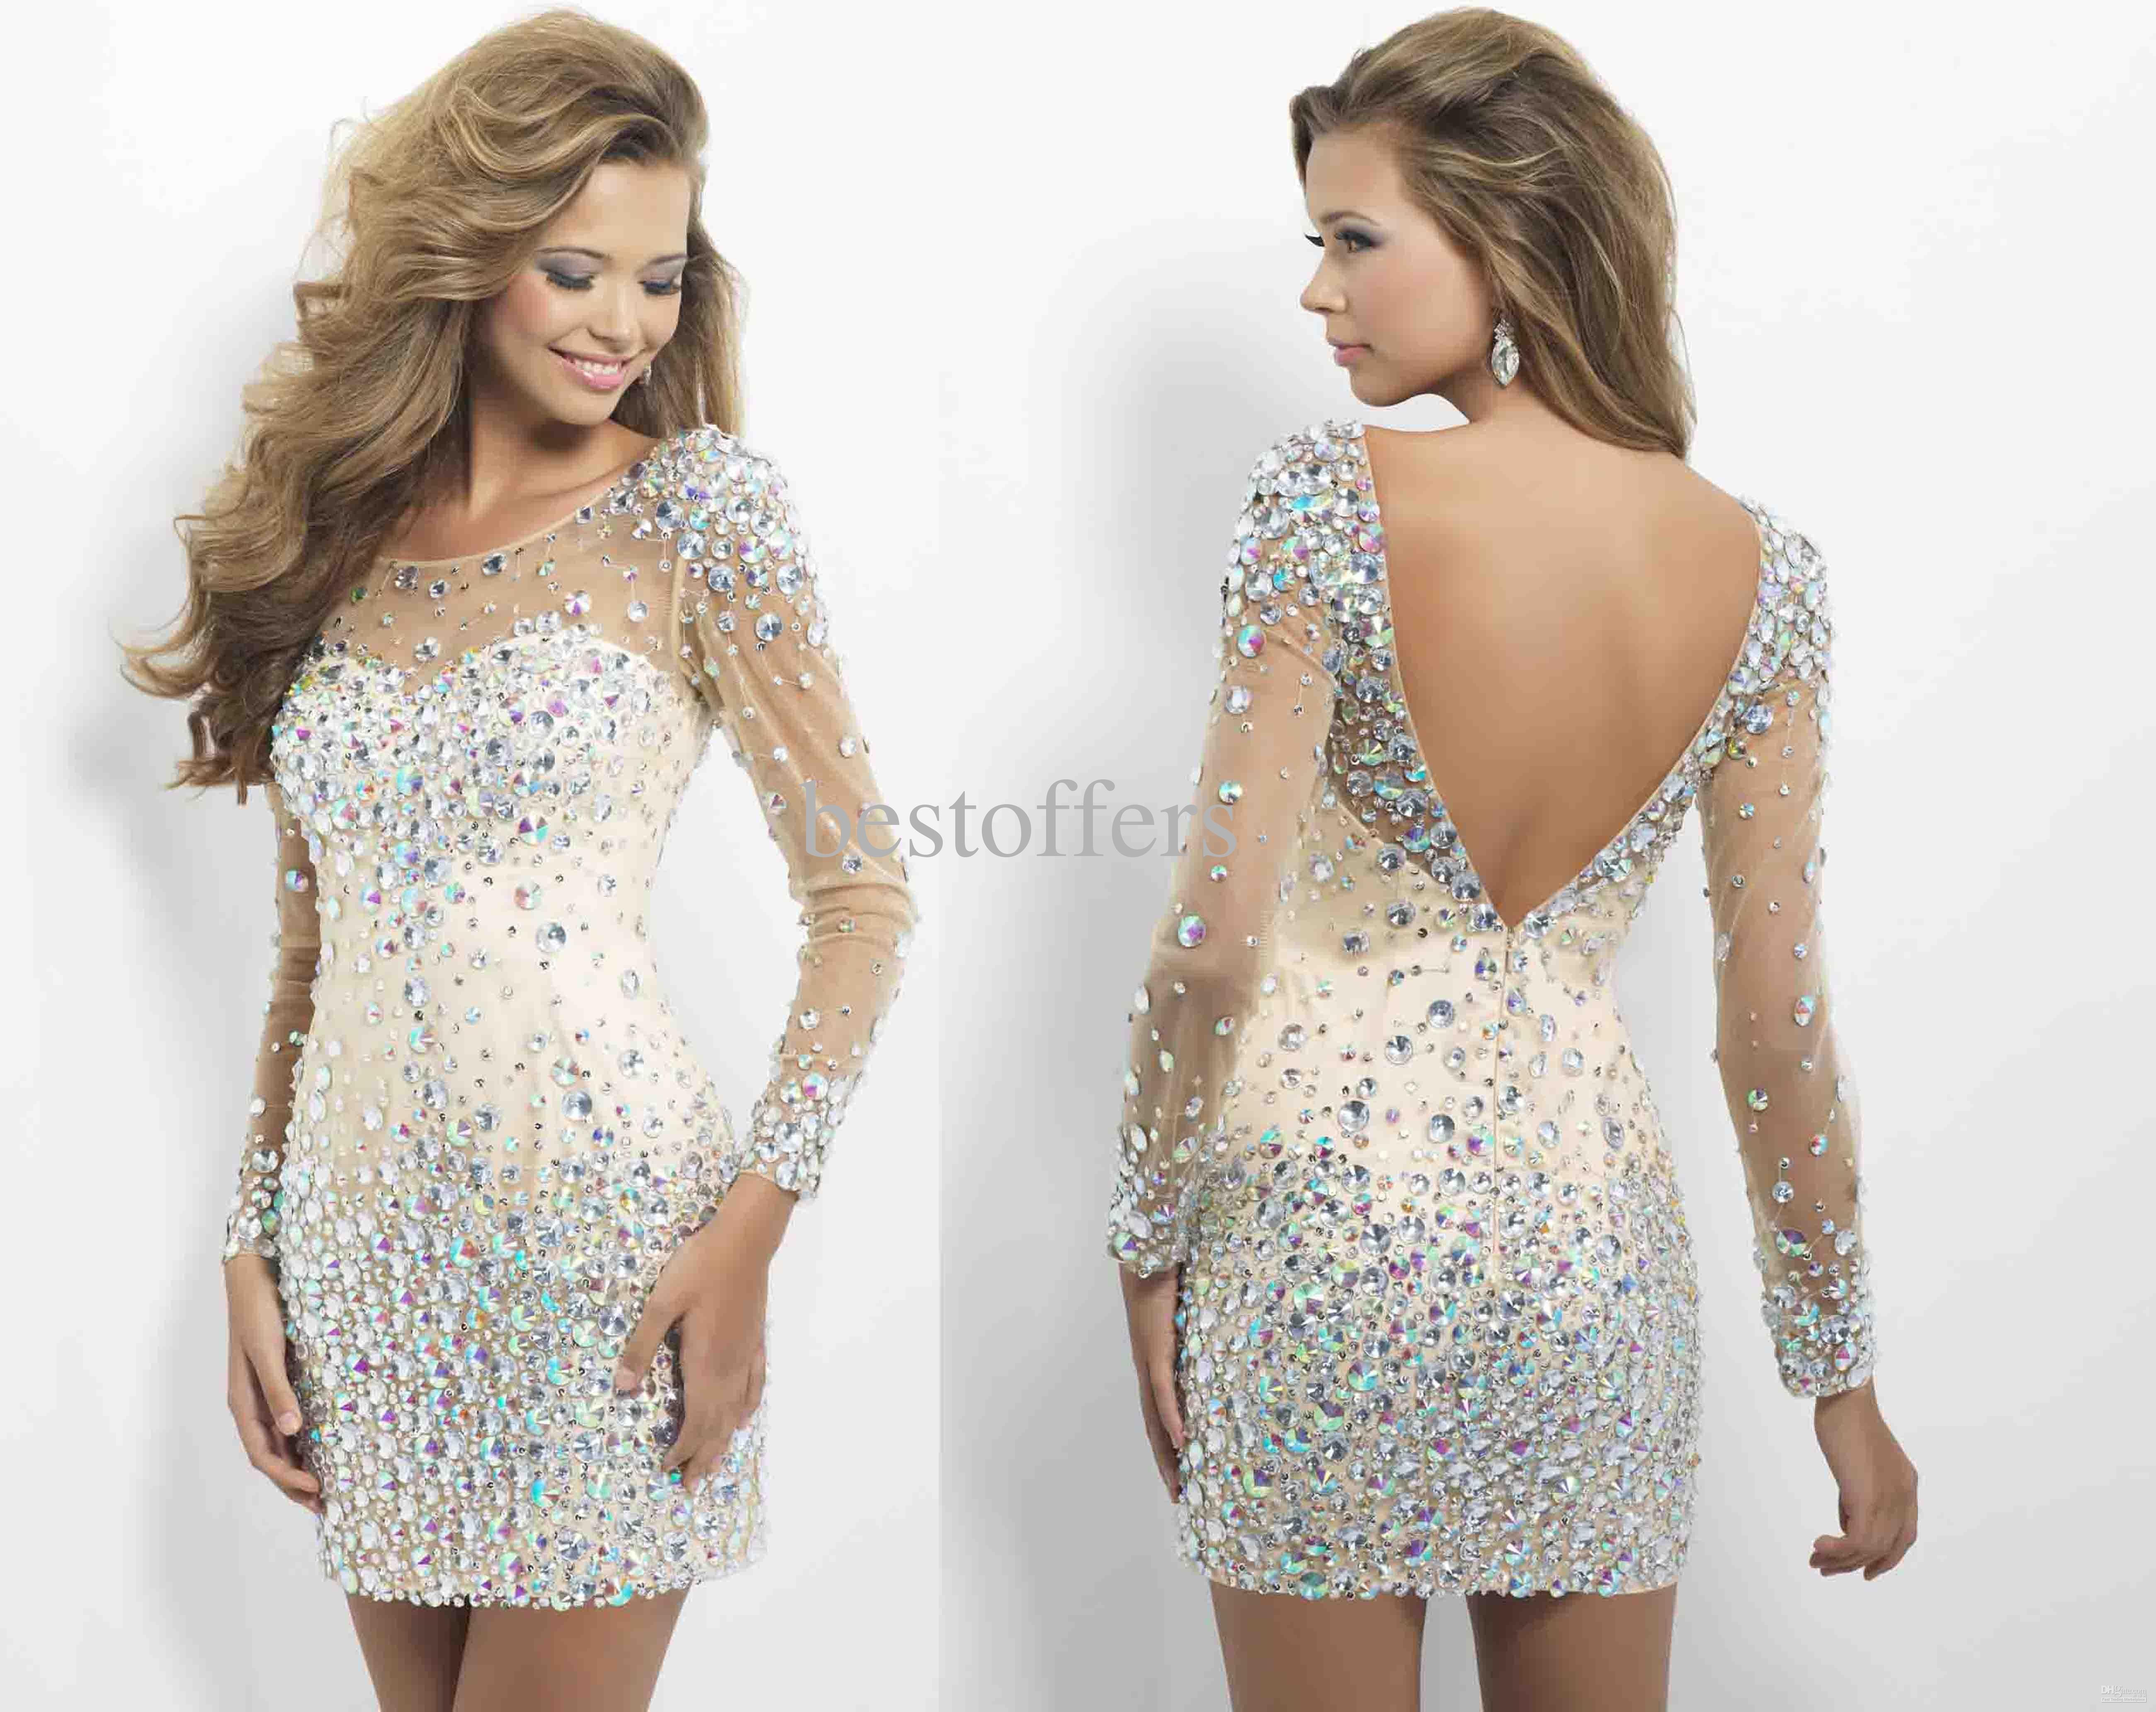 Wholesale custom made lace sheer long sleeve one shoulder sheath